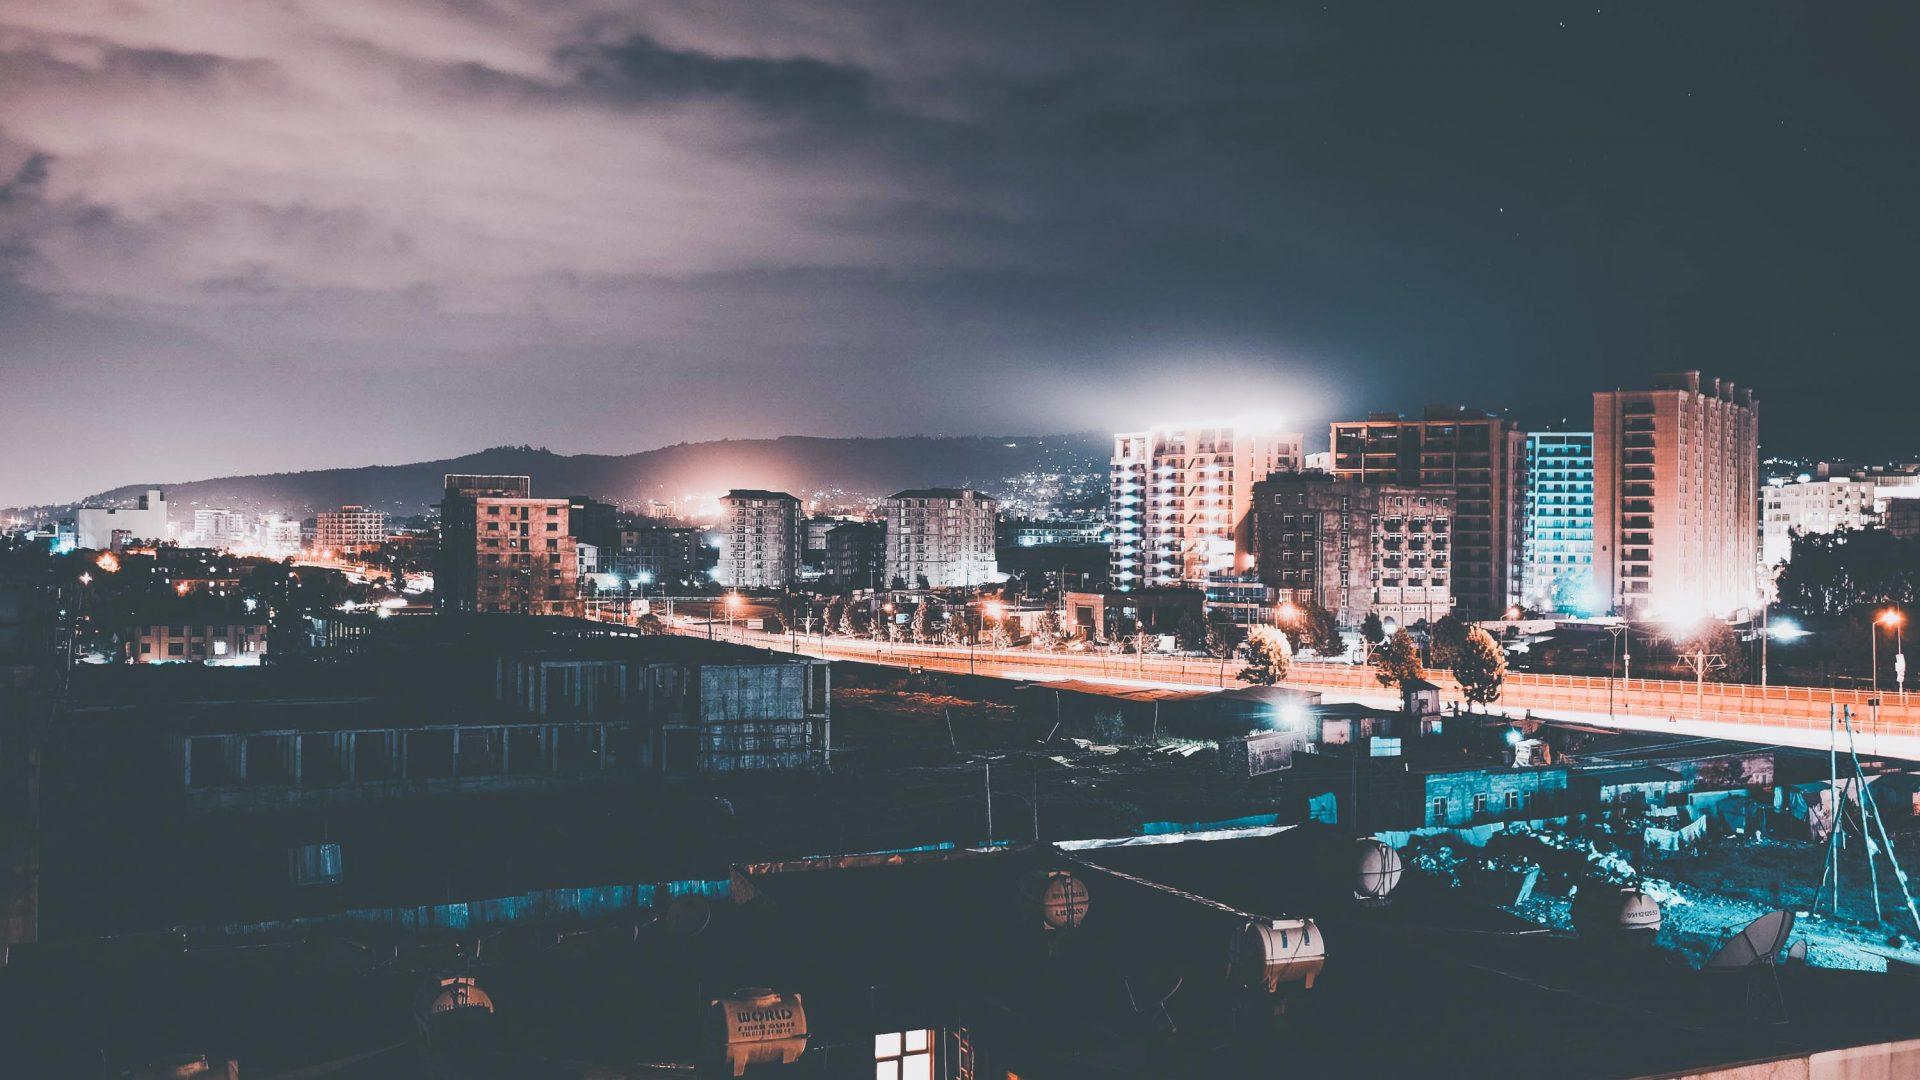 Addis Ababa, the capital of Ethiopia.